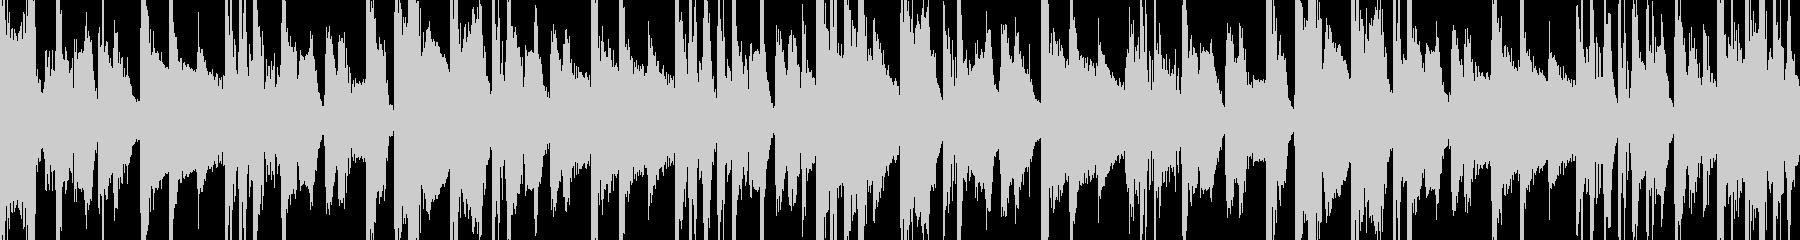 VOサンプル入りHIPHOPピアノループの未再生の波形